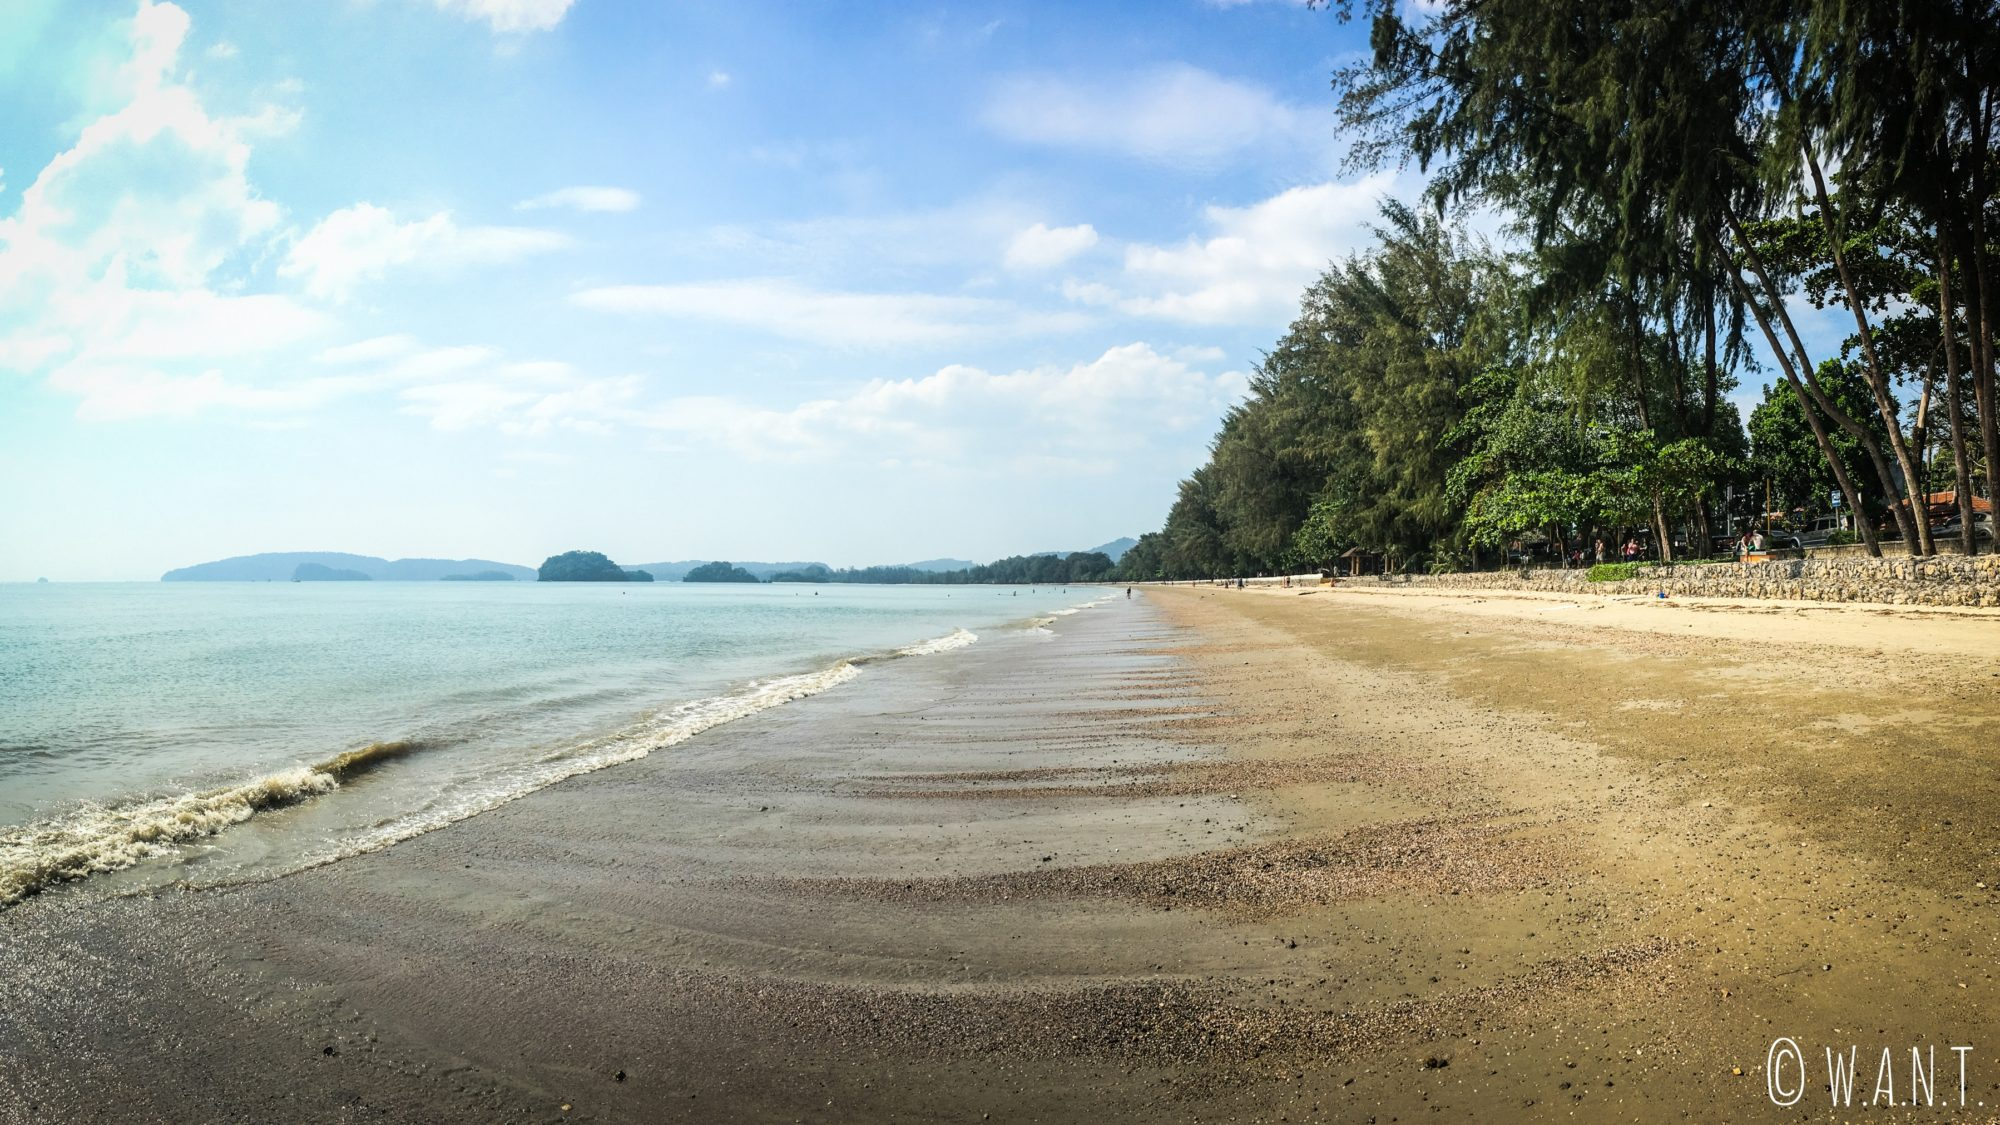 Panorama de la plage Noppharat Thara dans la province de Krabi